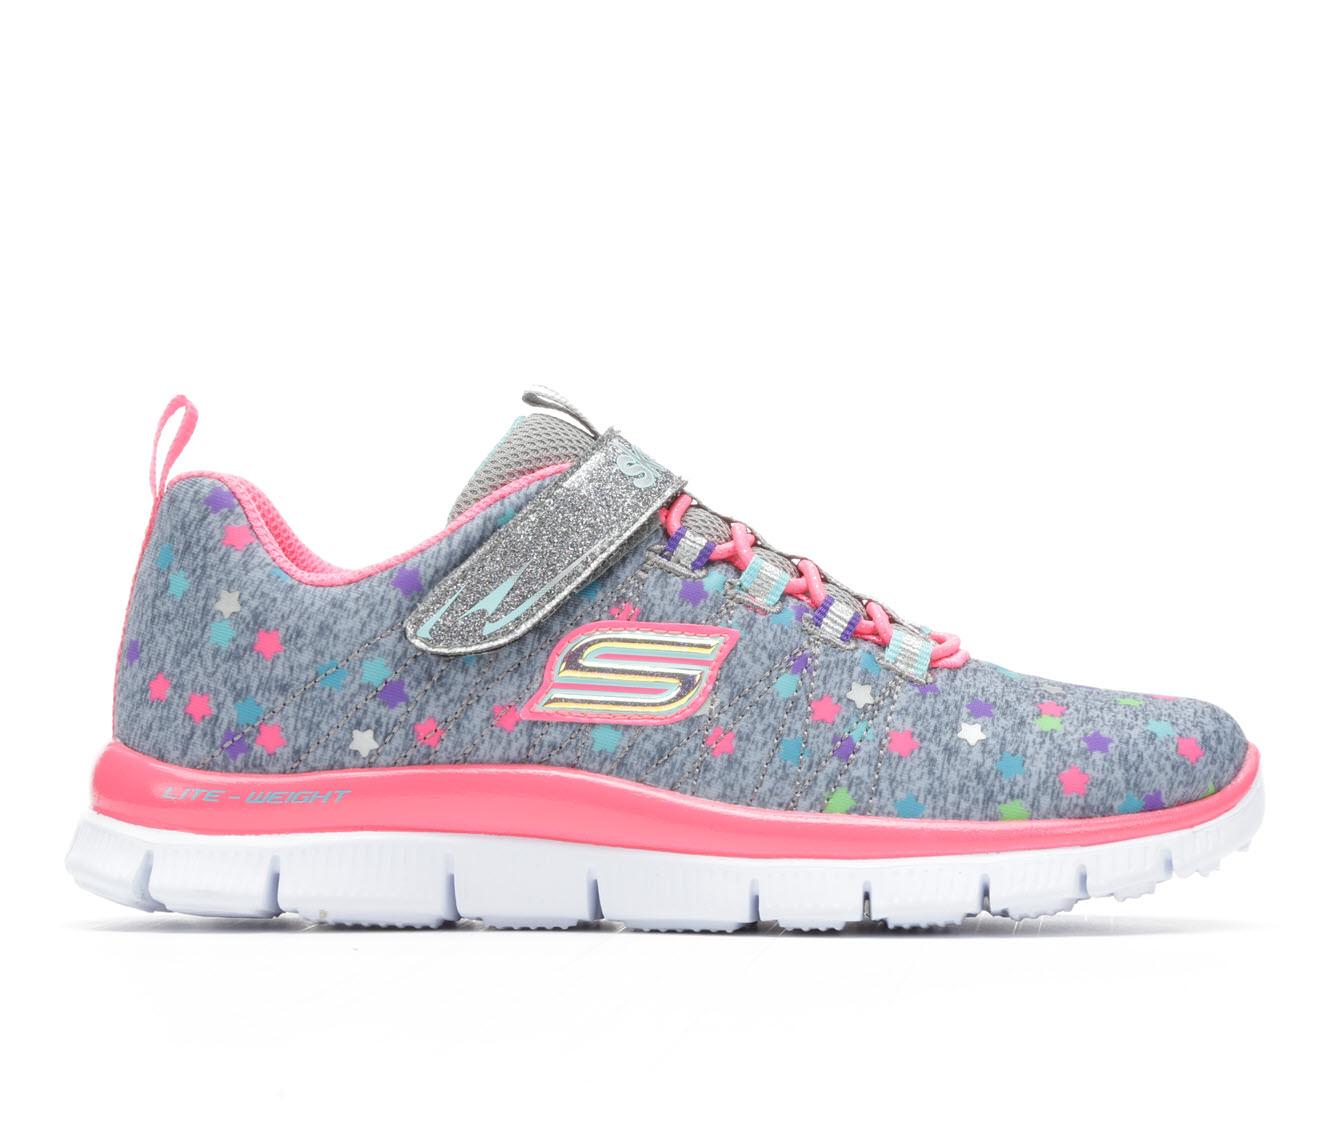 Girls' Skechers Skech Appeal Star Spirit Sneakers (Grey)